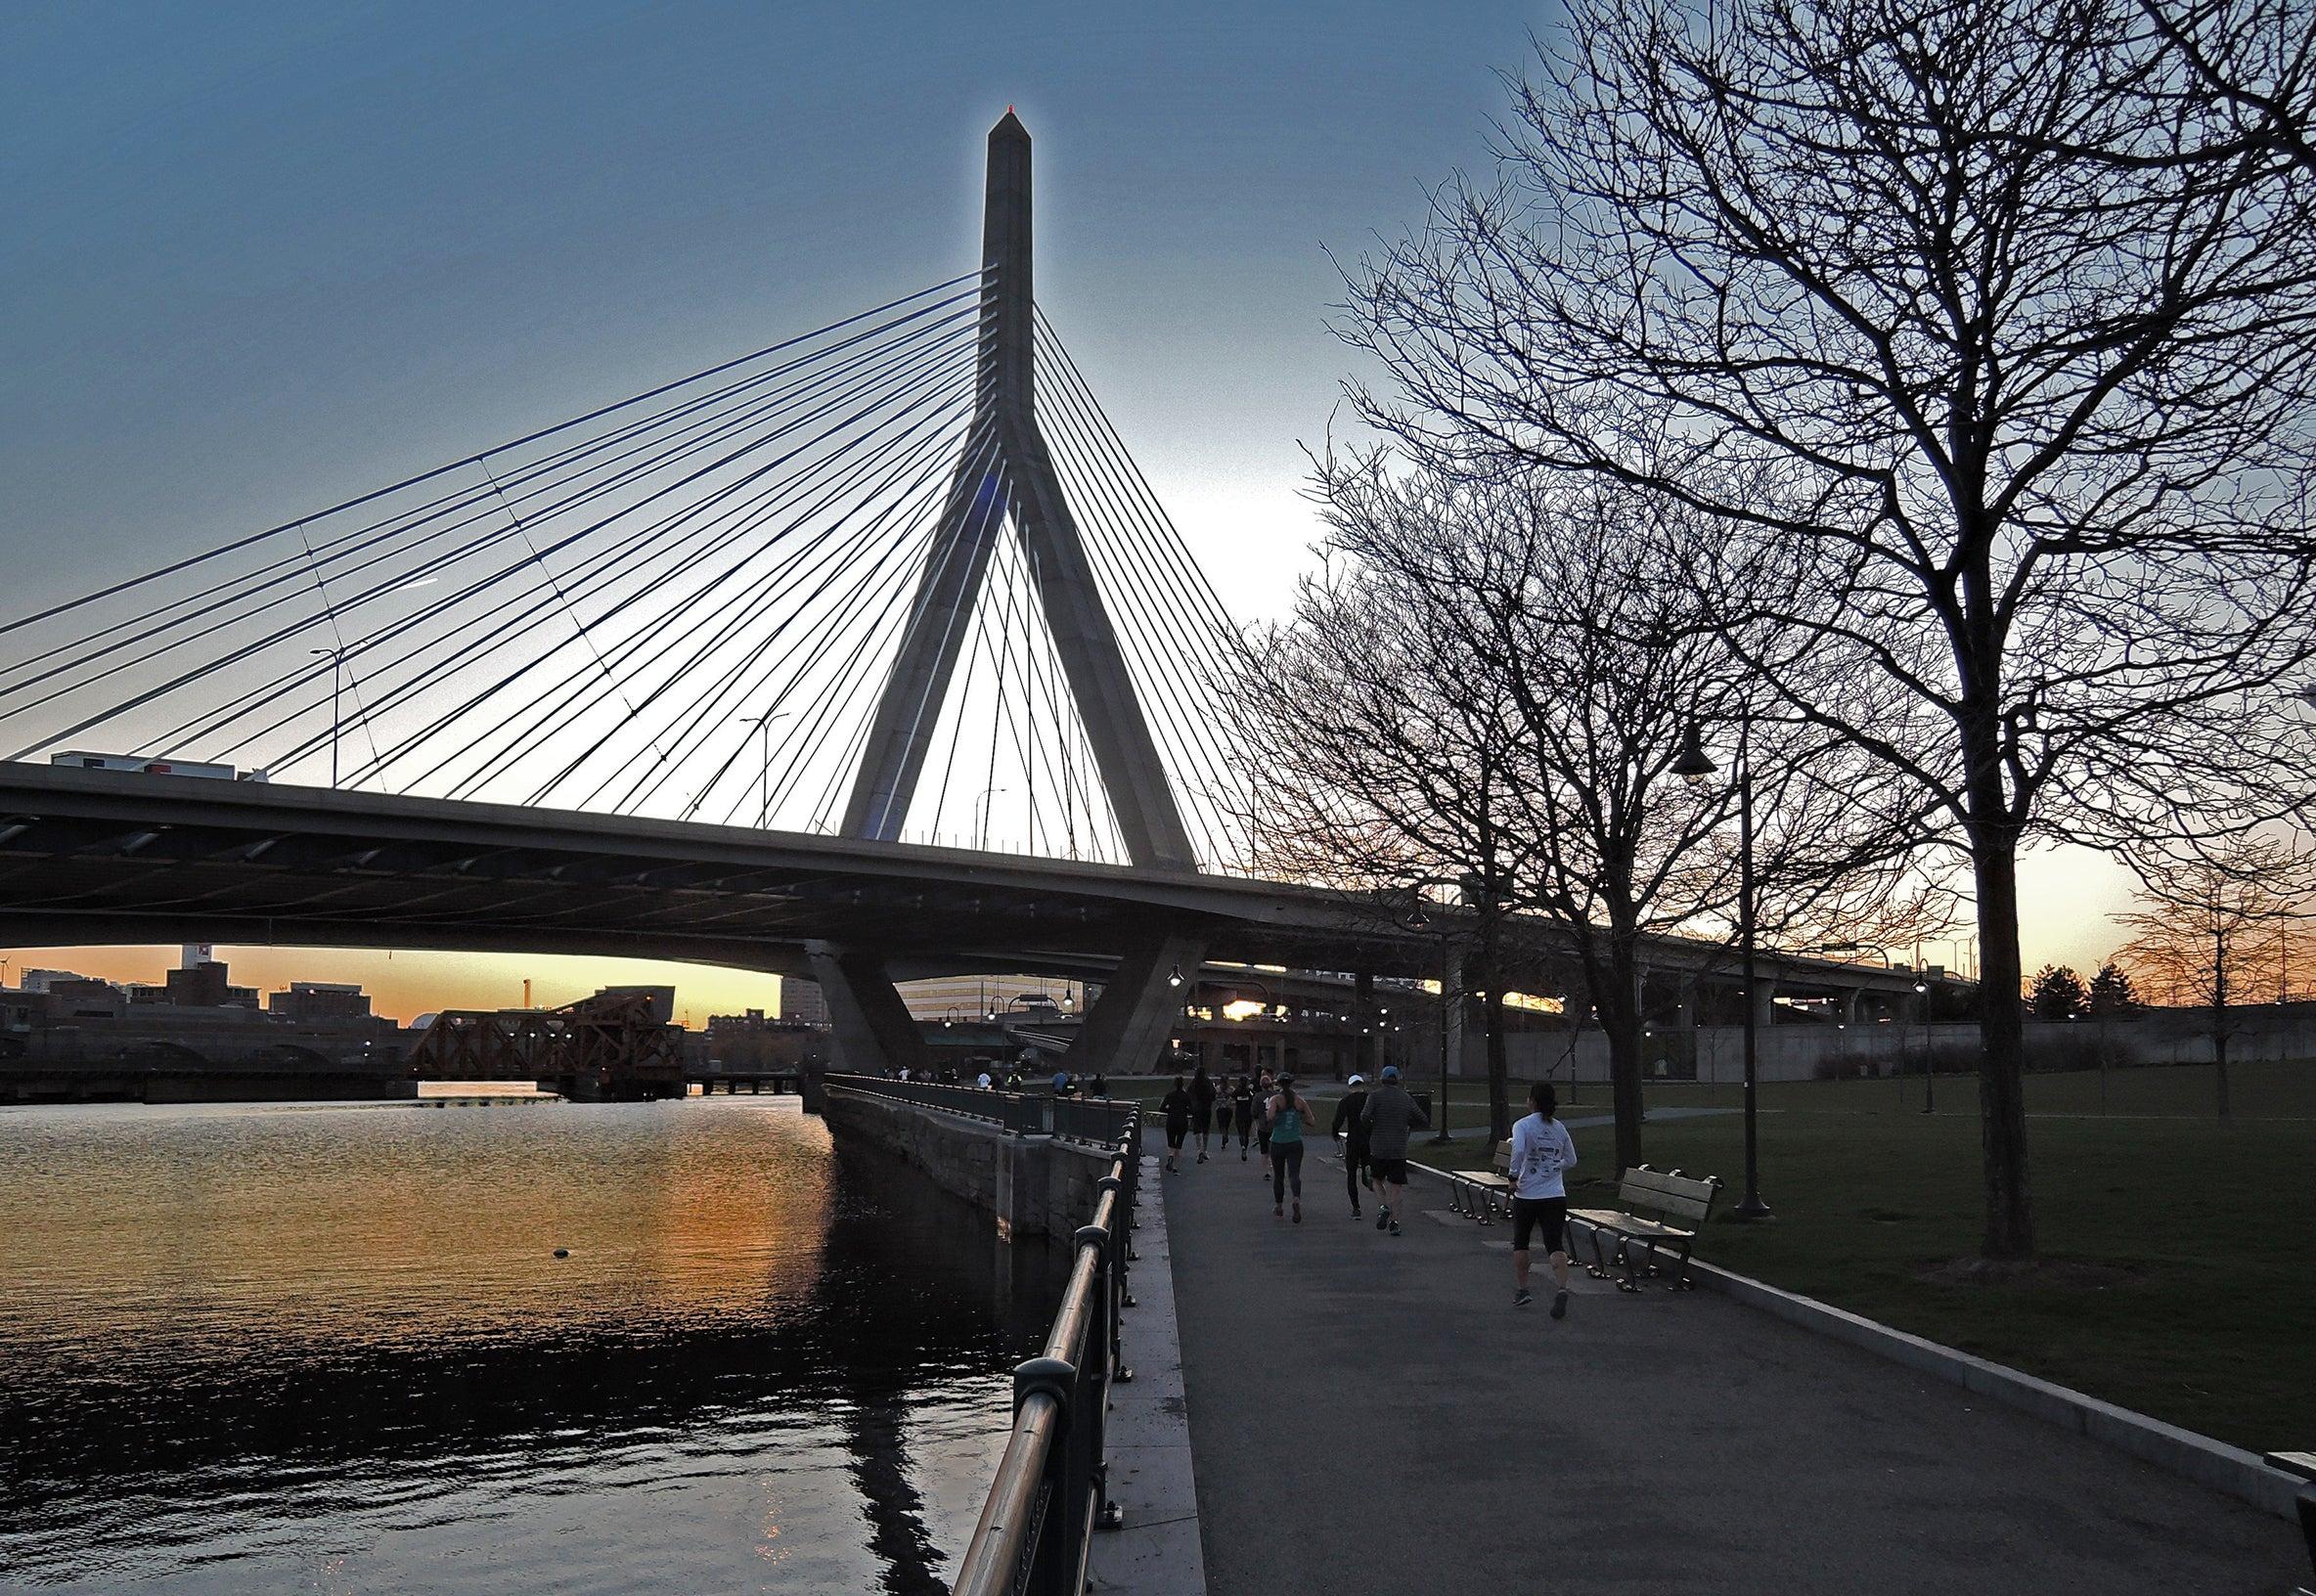 Running Charles River Boston